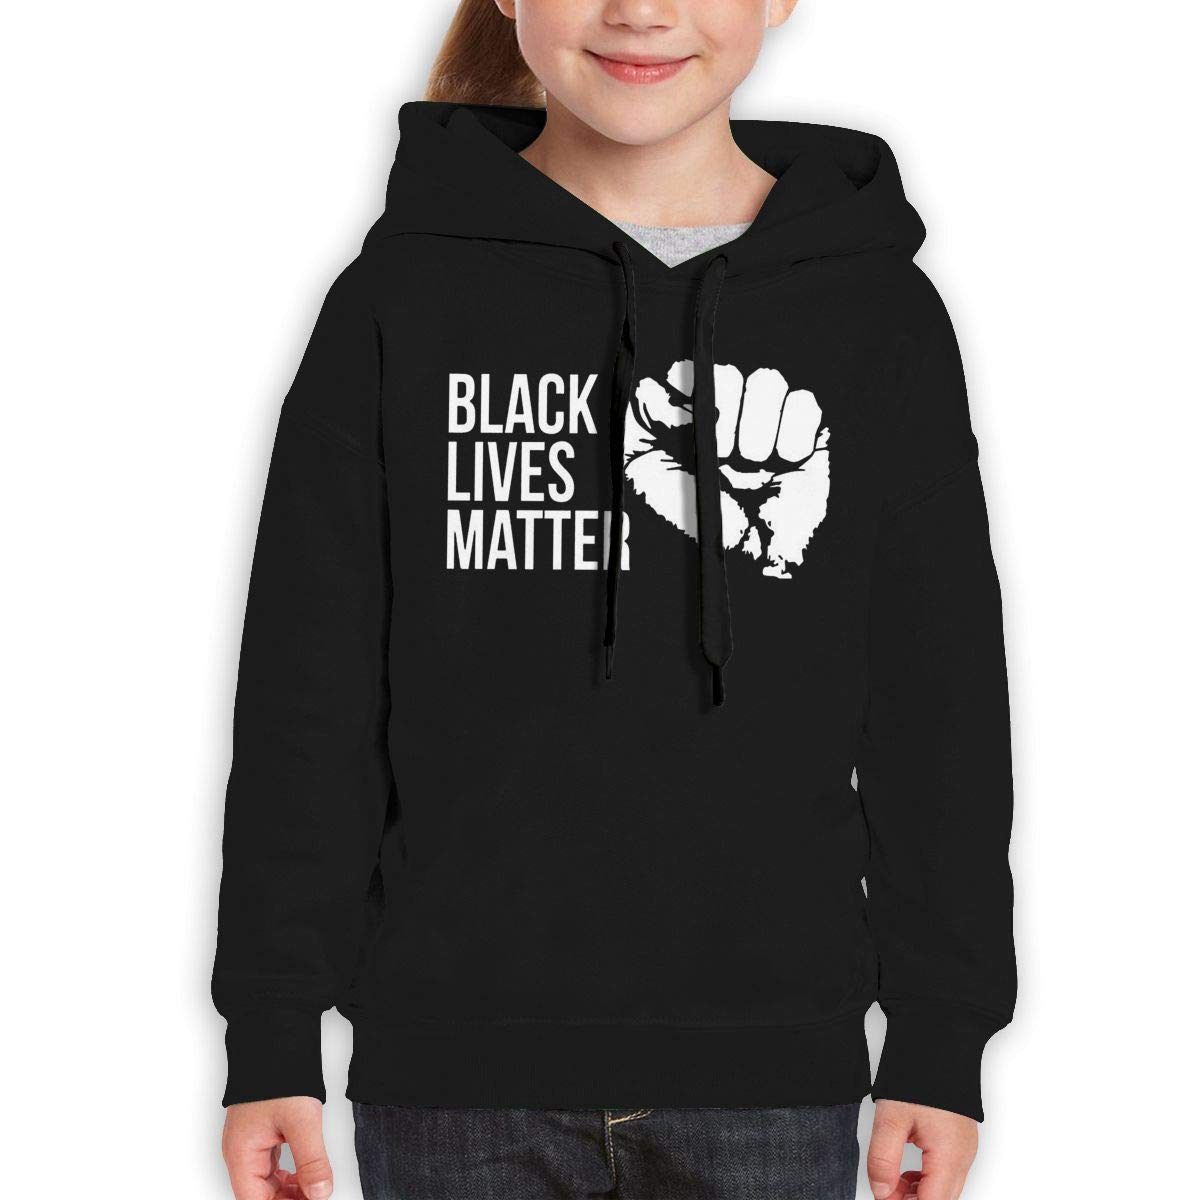 Teen Hooded Sweate Sweatshirt Black Guiping Black Lives Matter 2